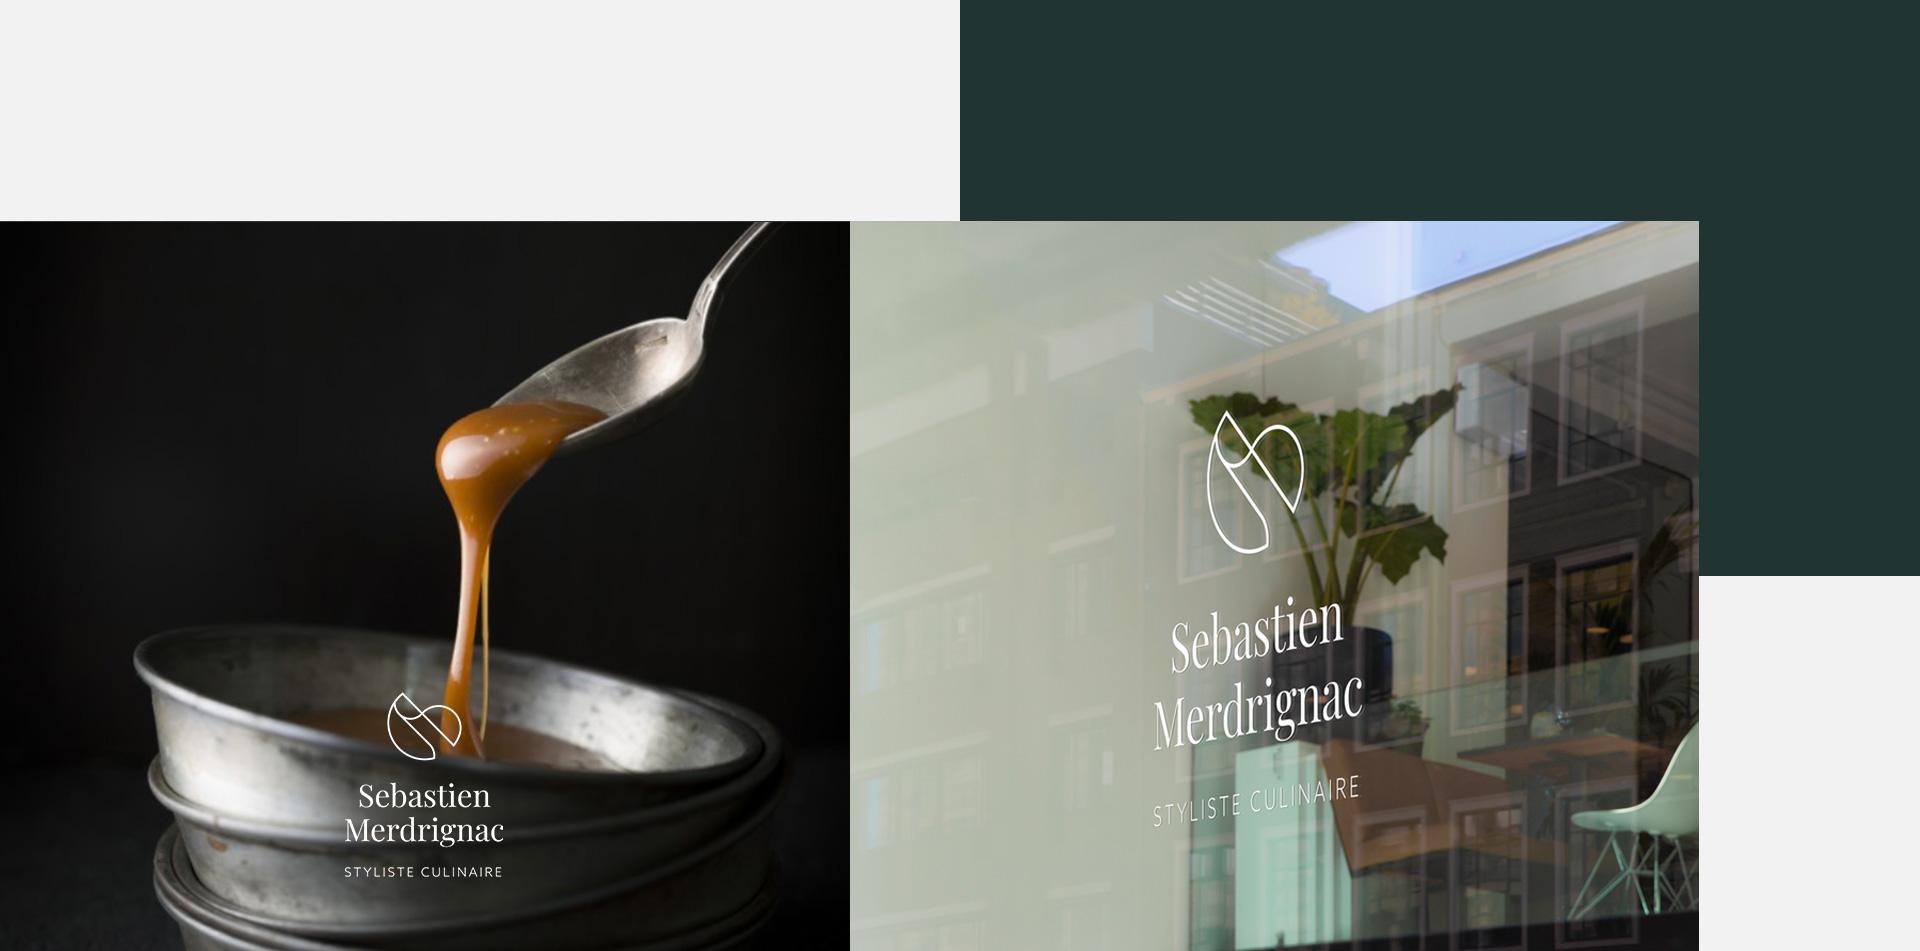 Zpok-design-identite-visuelle-logotype-styliste culinaire-vitrophanie